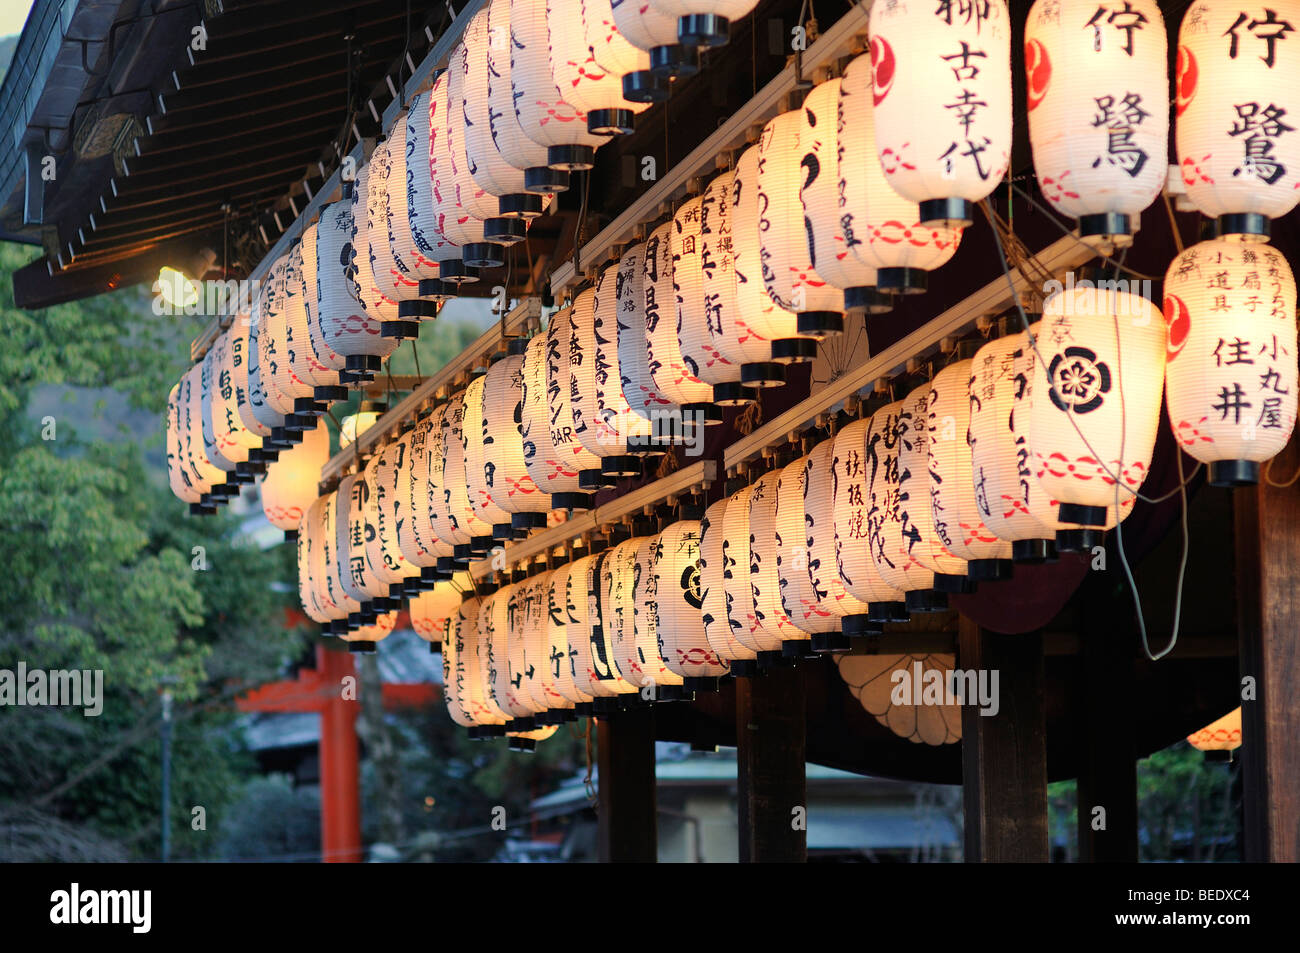 Burning lanterns in the Yasaka Shrine in Kyoto, Japan, East Asia, Asia Stock Photo